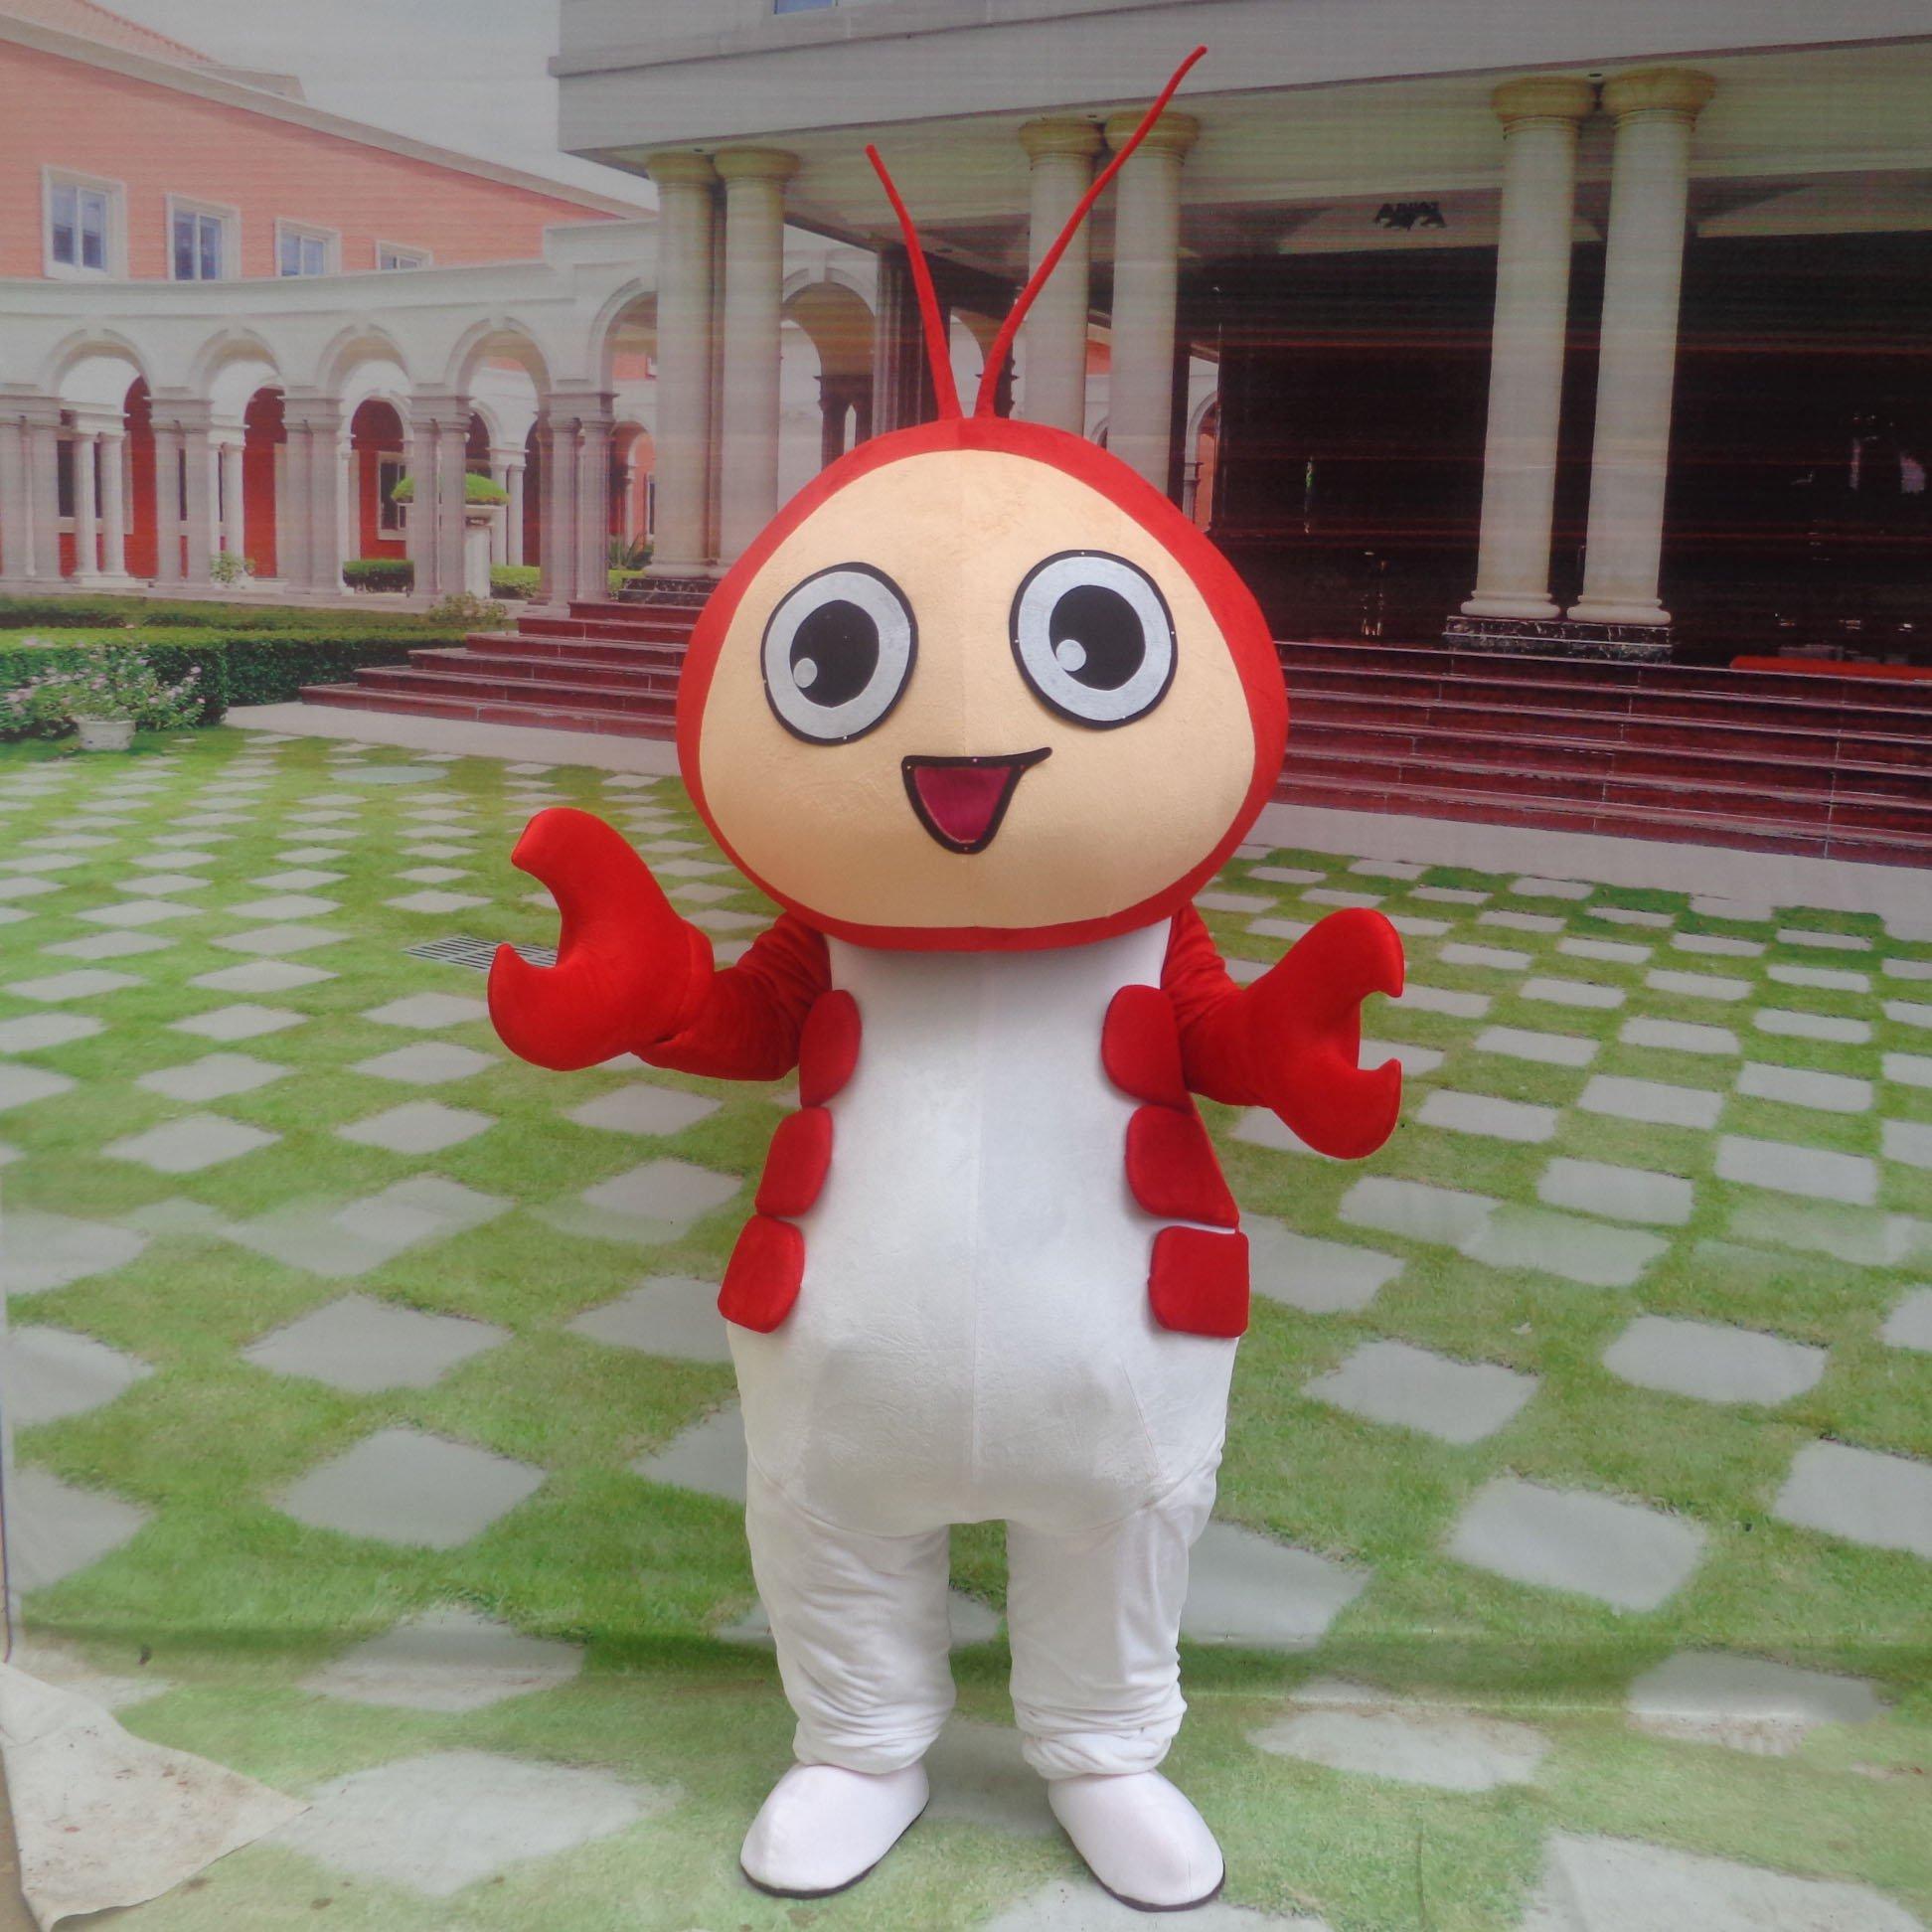 Cartoon Doll Clothing Cartoon Walking Doll Clothing Cartoon Show Clothing Plush Dolls Doll Clothes Shrimp Mascot Costume